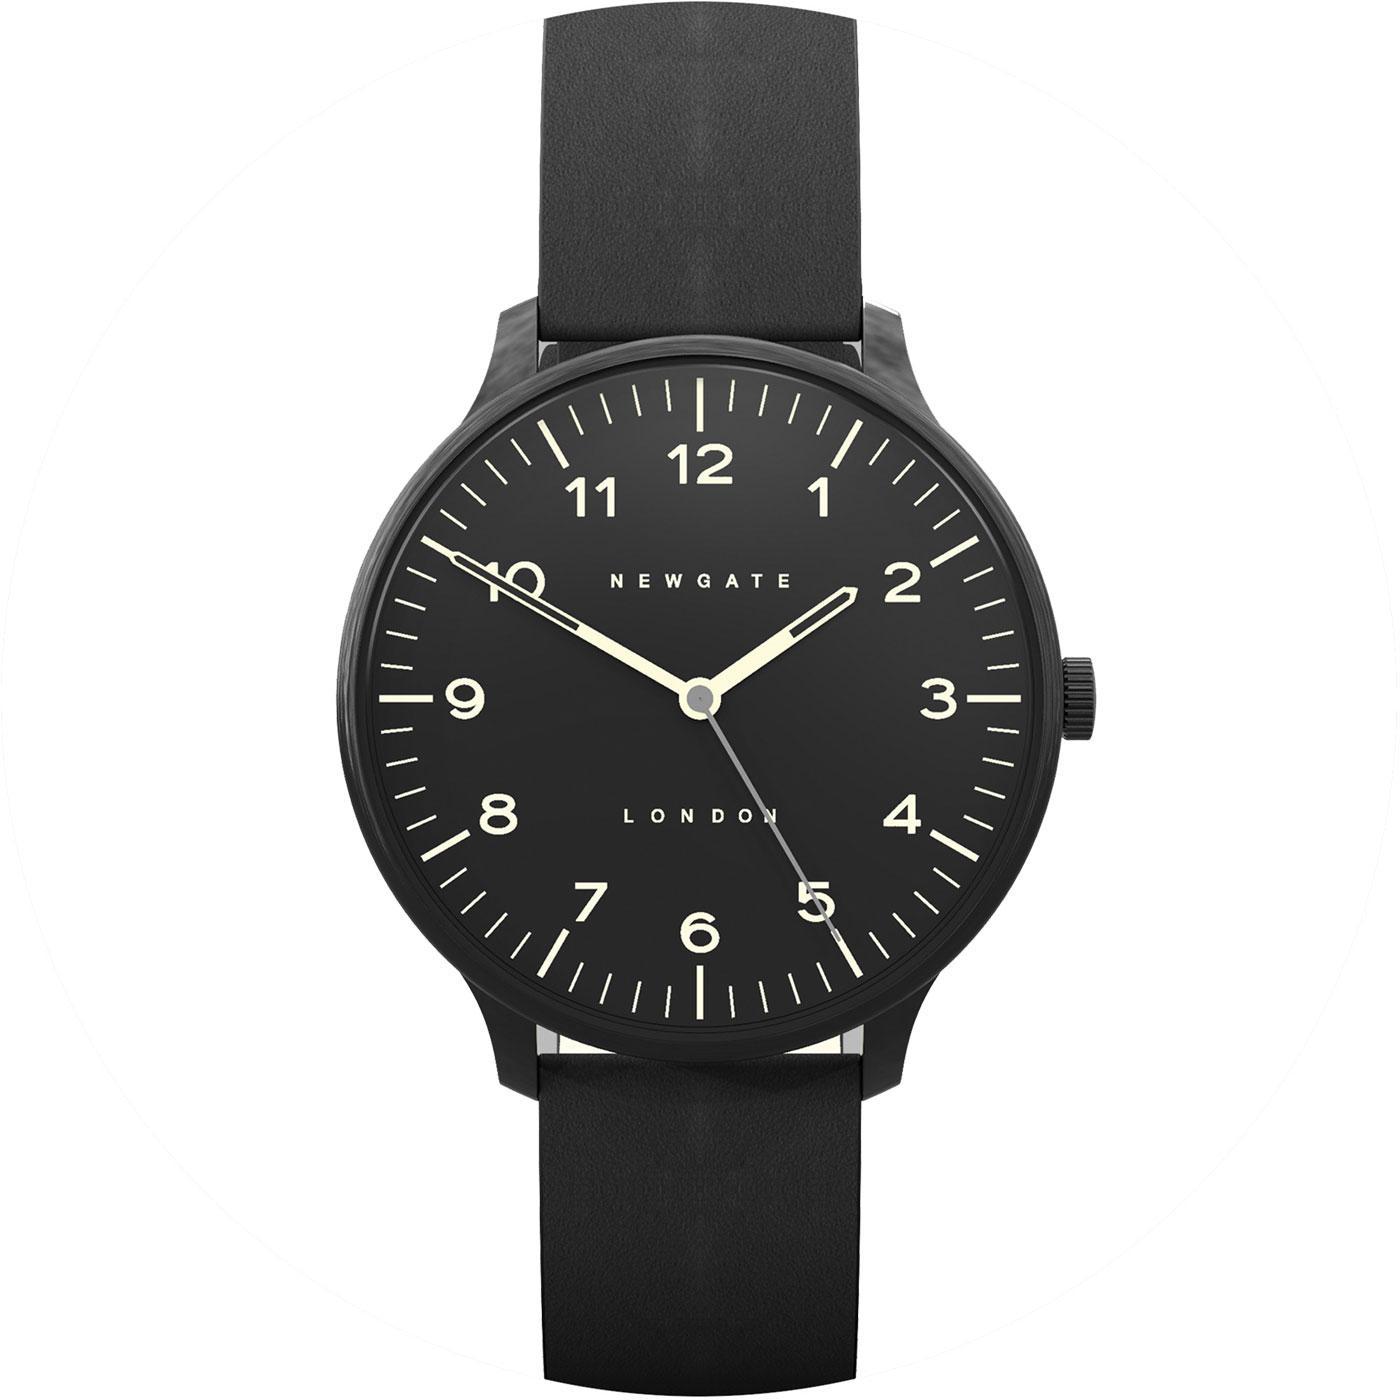 The Blip NEWGATE CLOCKS Retro Leather Watch Black